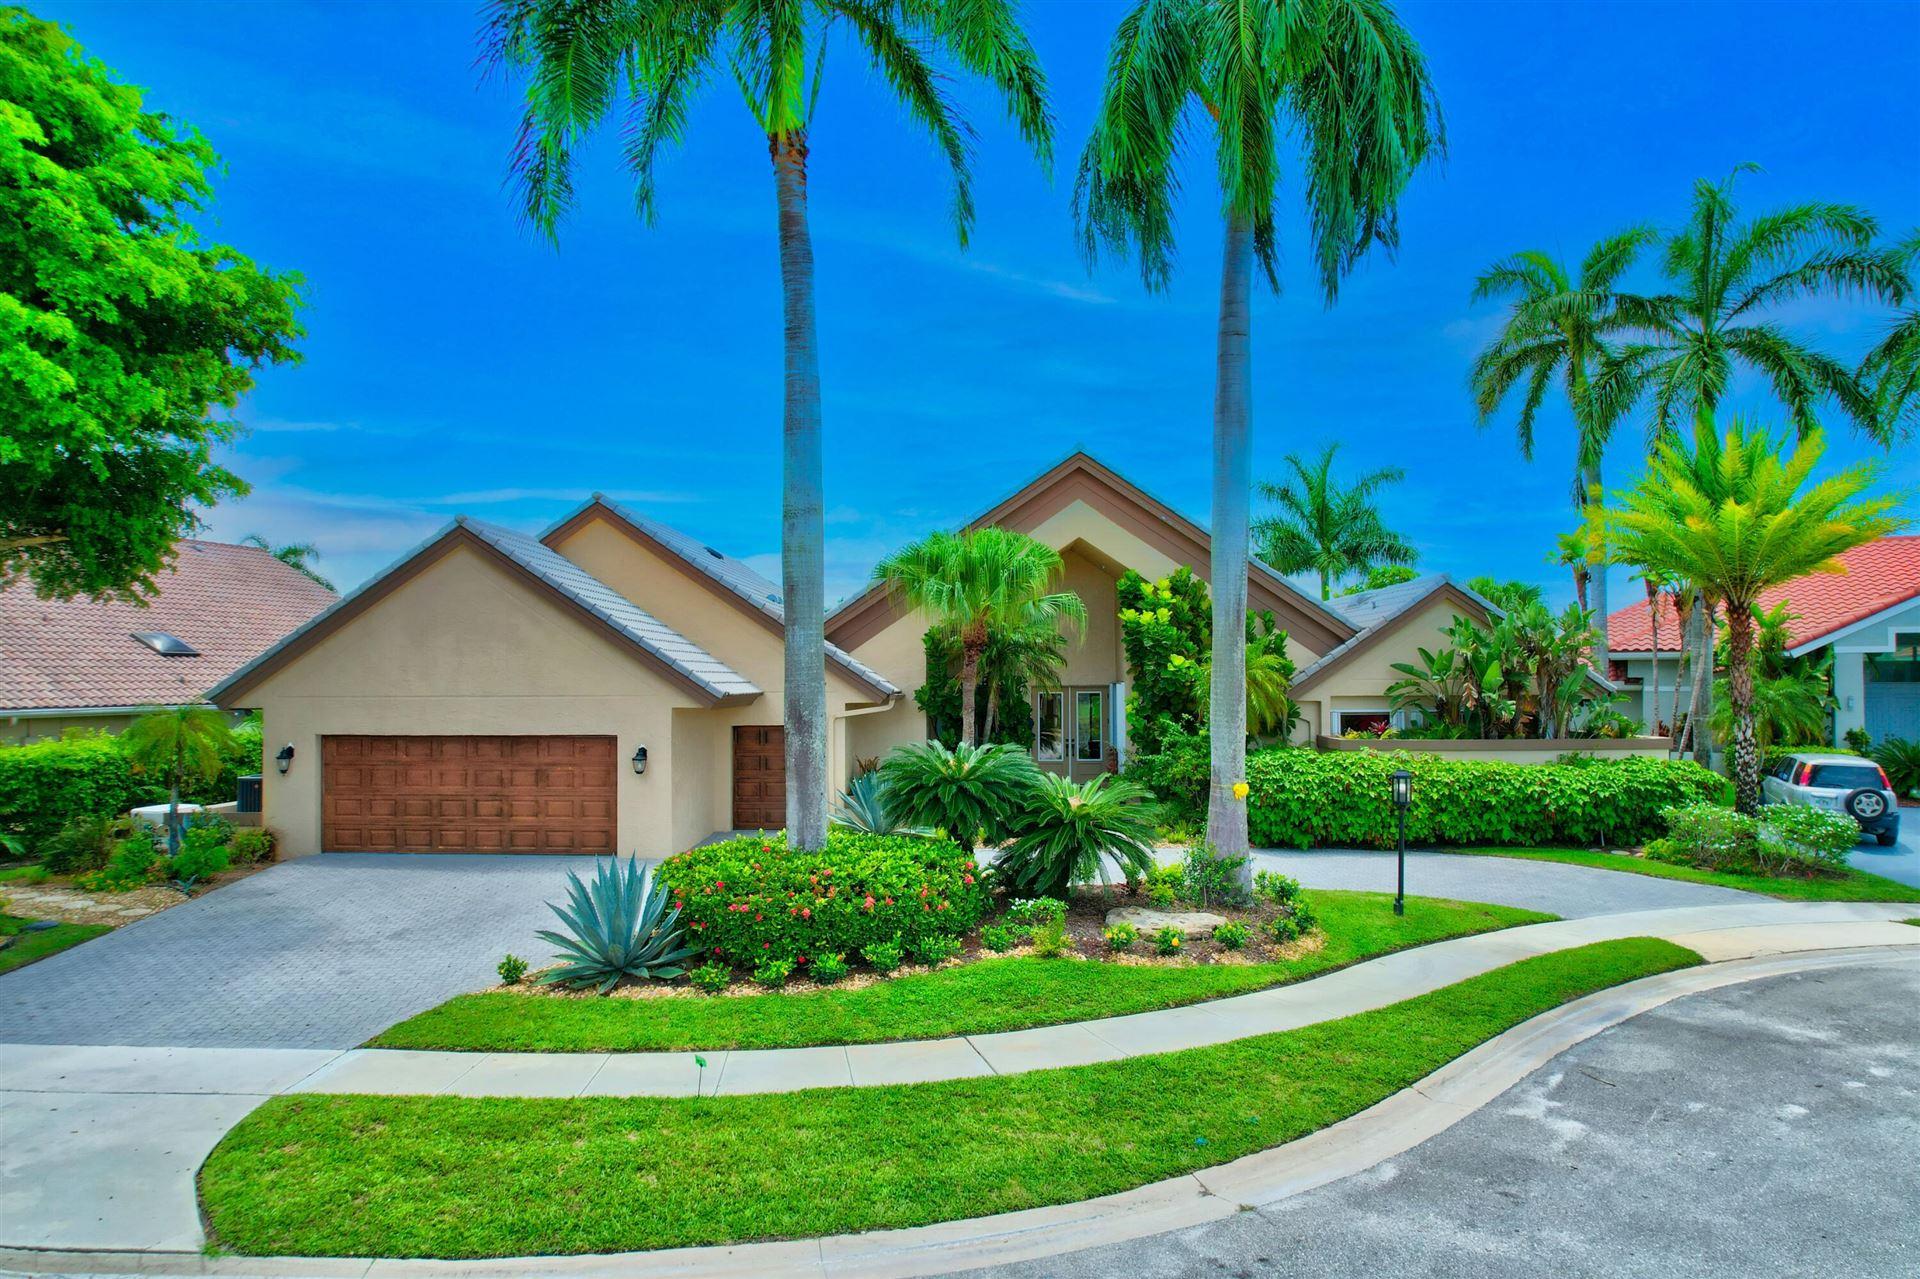 17799 Heather Ridge Lane, Boca Raton, FL 33498 - #: RX-10728677